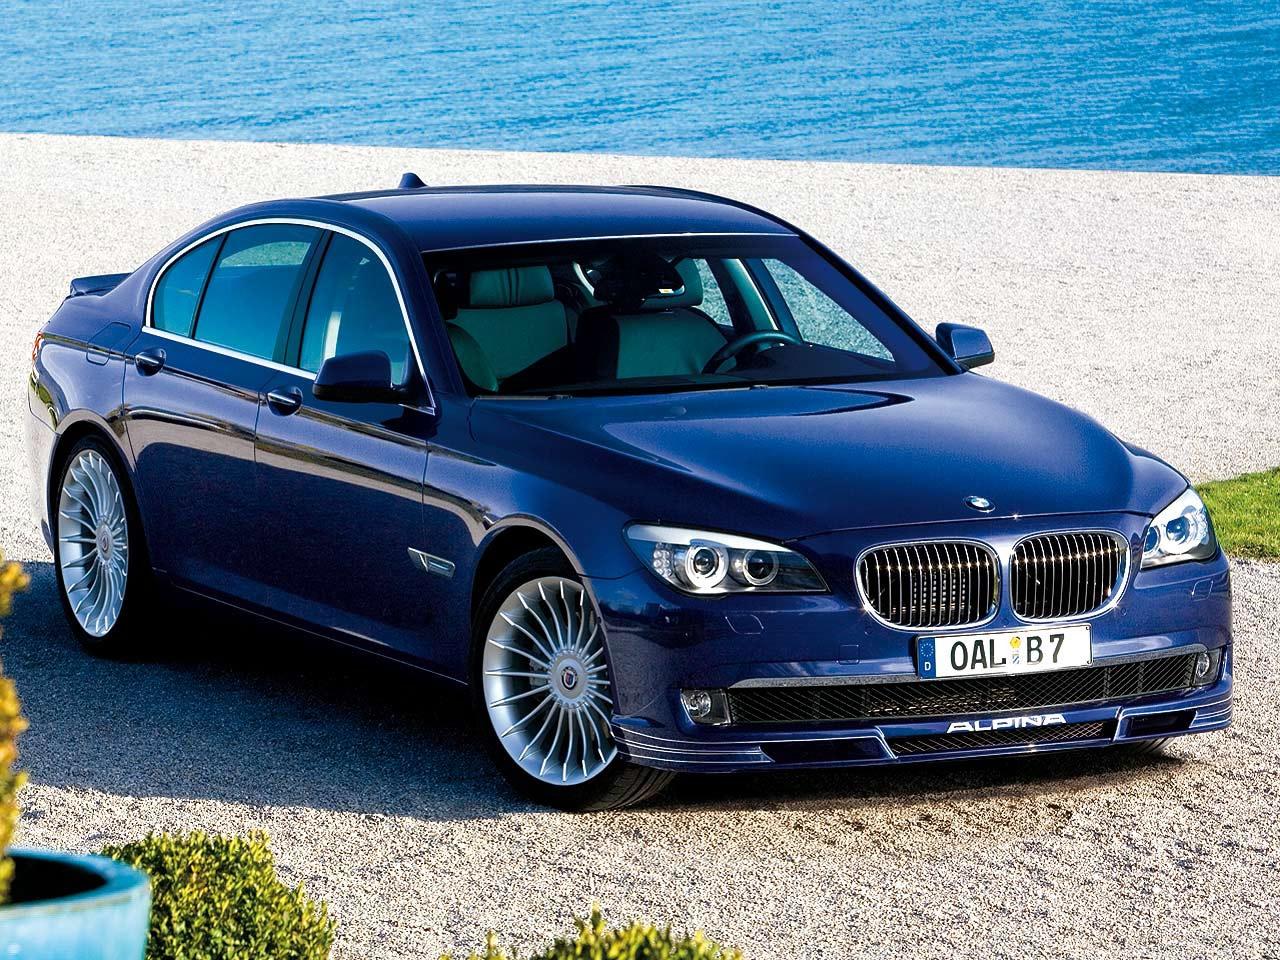 Car Automobile World April 2012